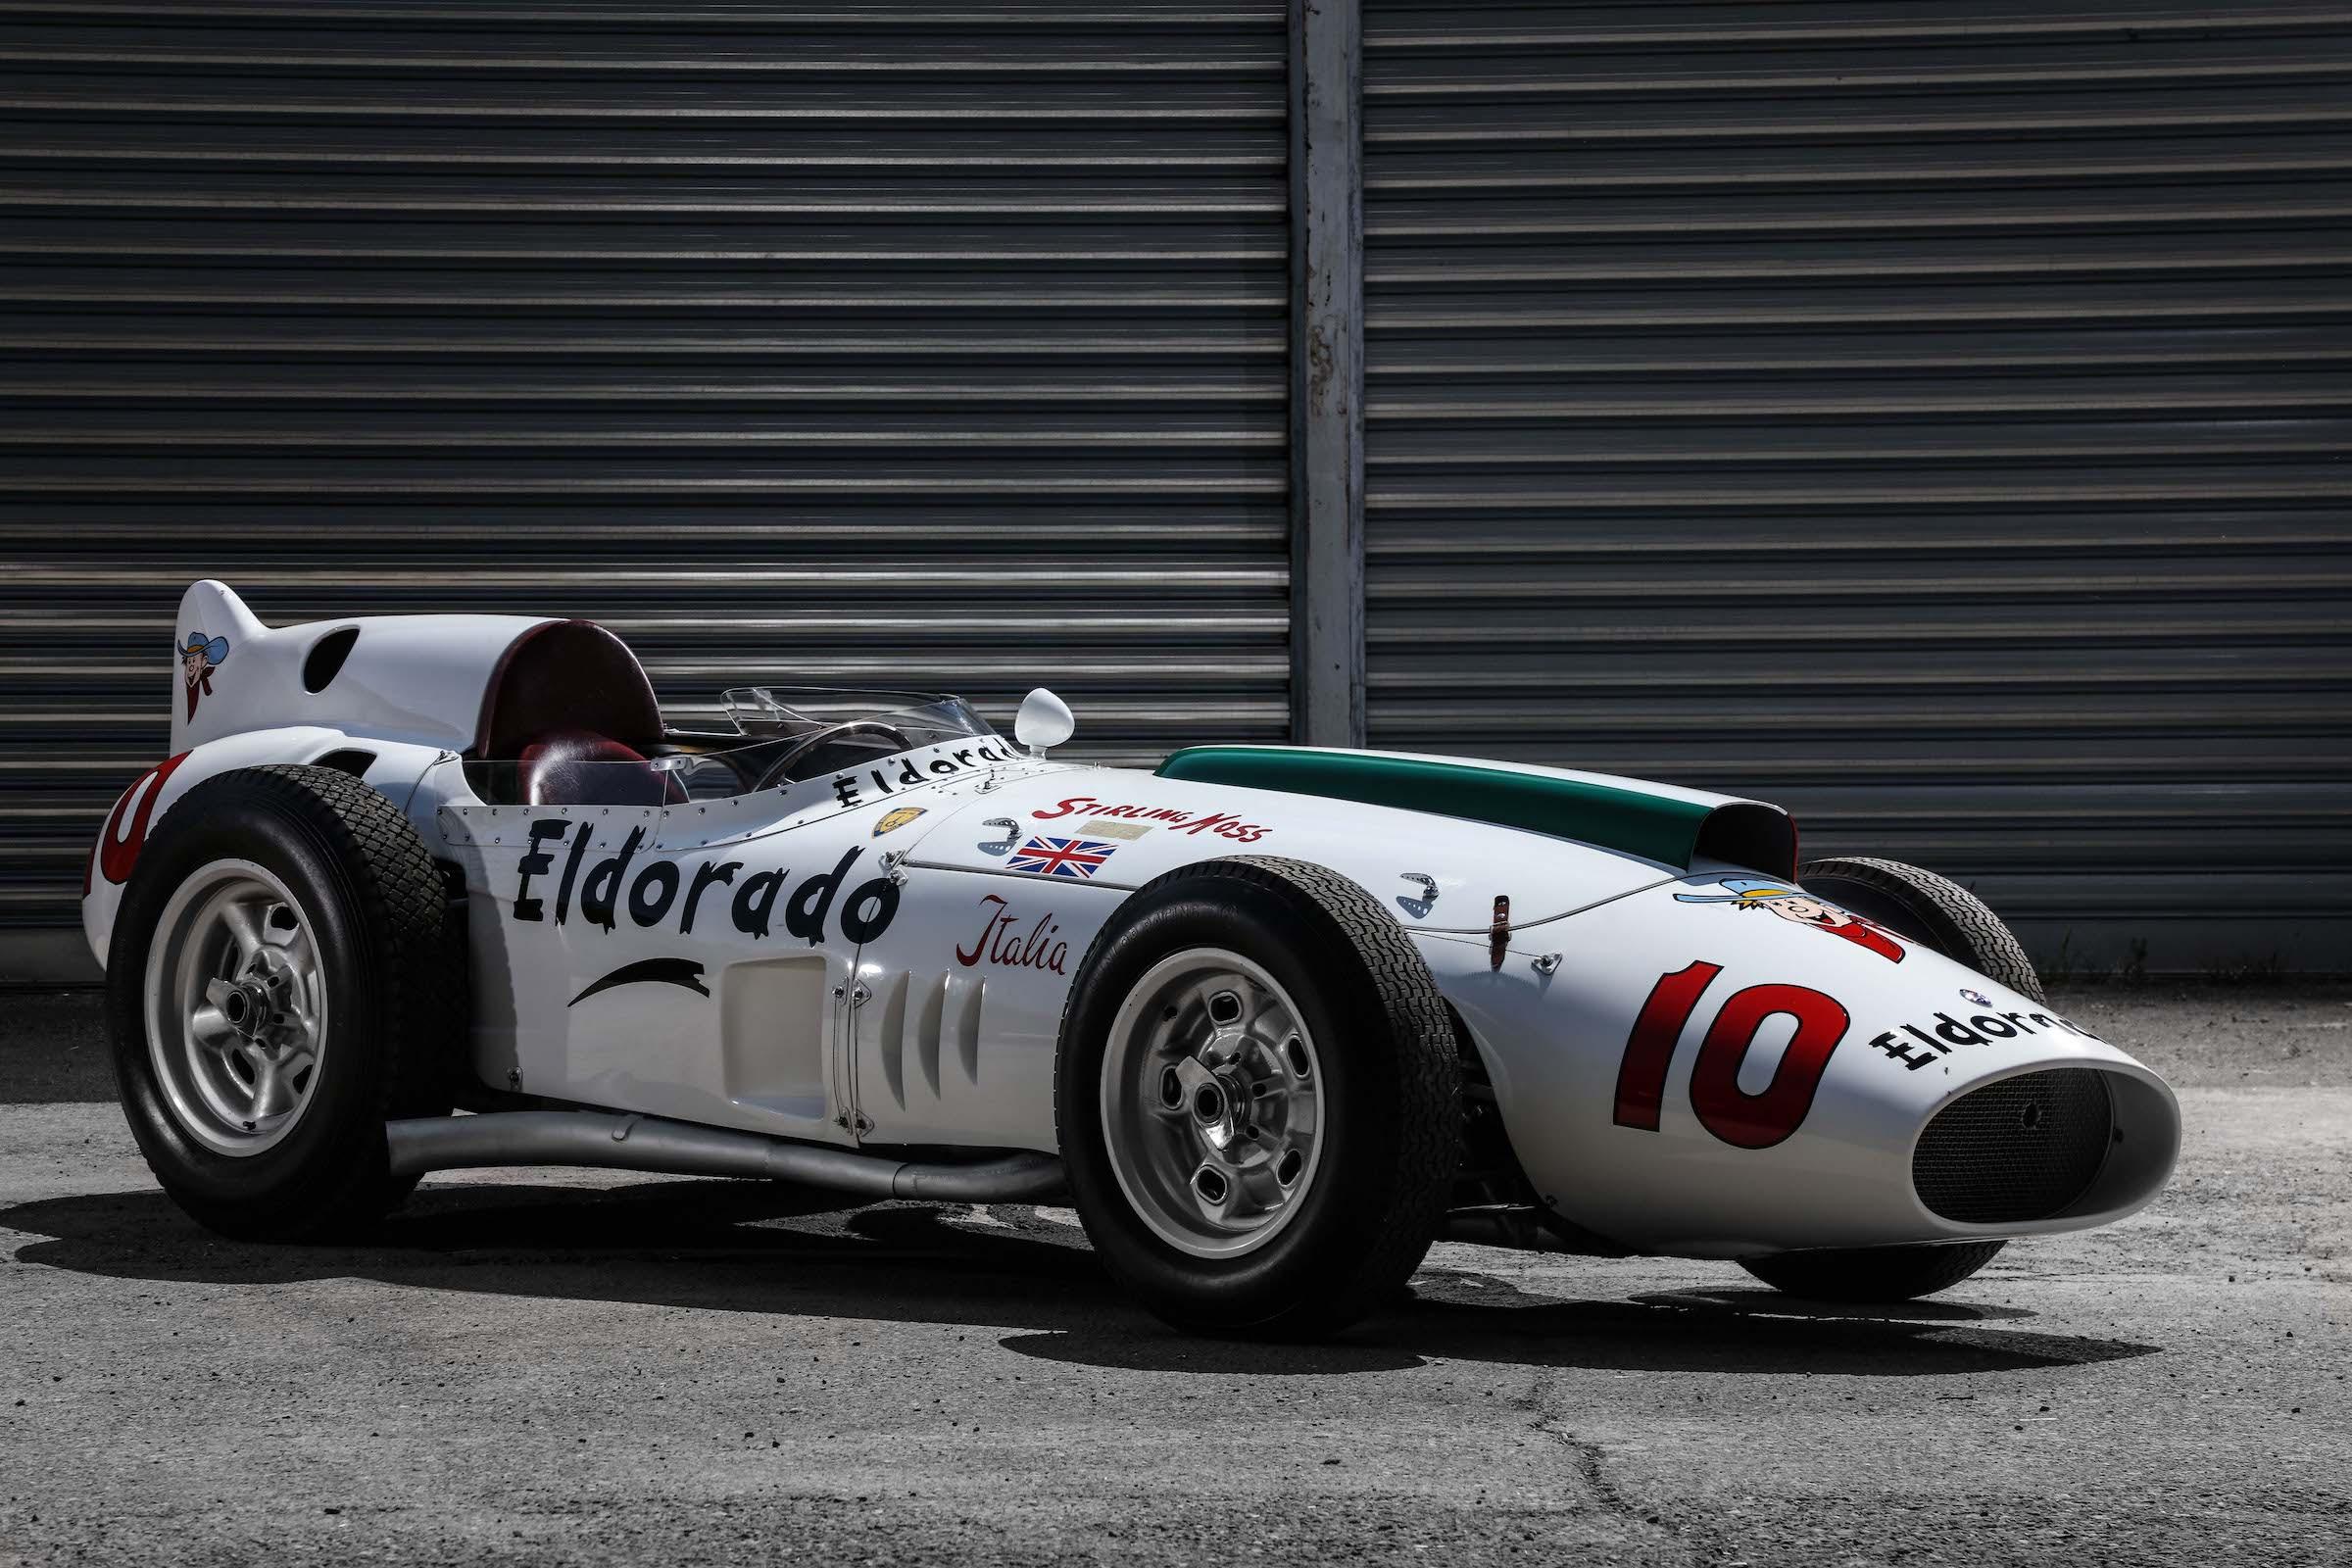 The Maserati Eldorado Tipo  The Monzanapolis Racer